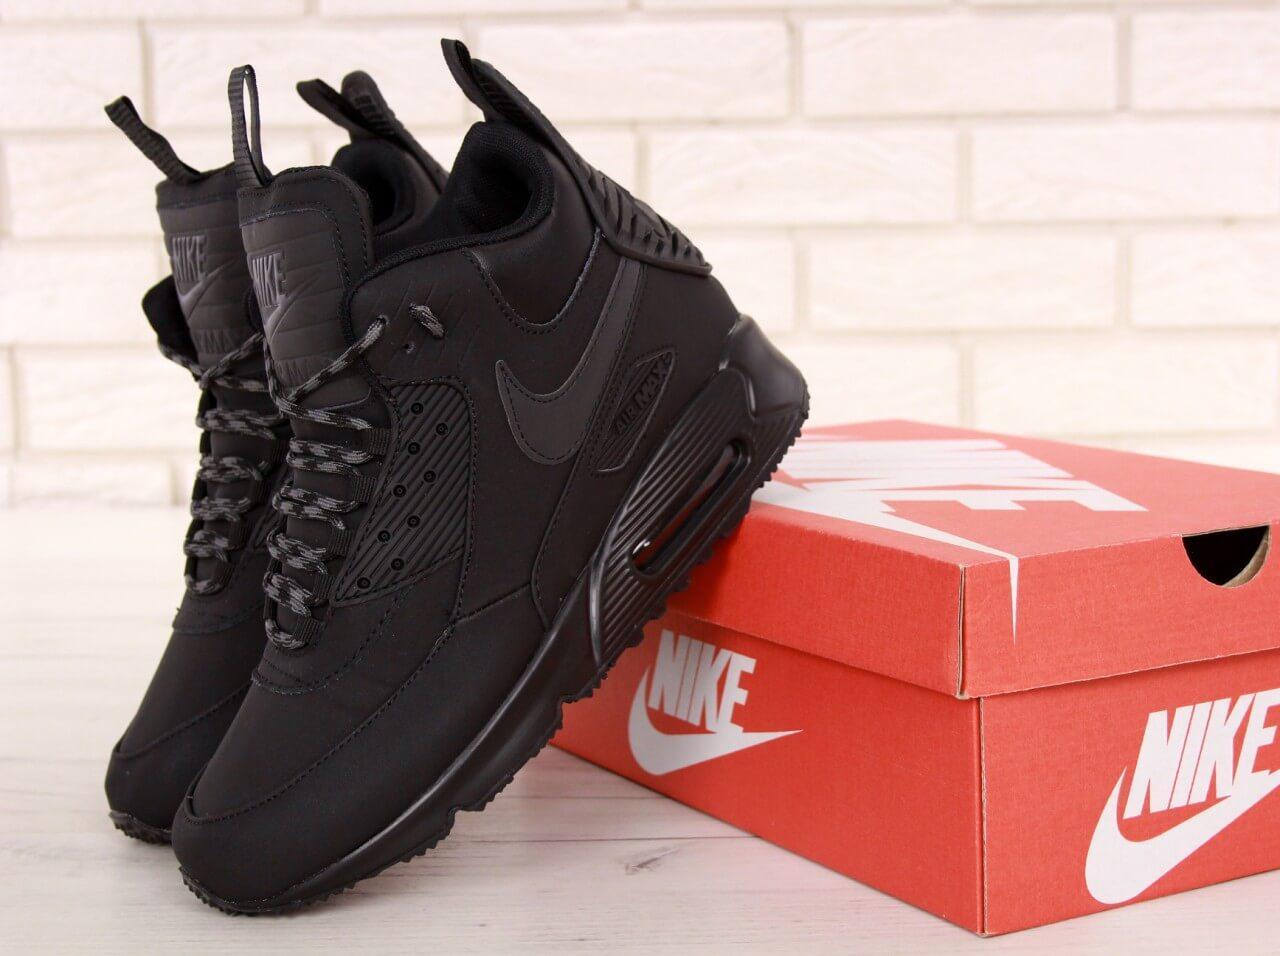 87d899ab Зимние мужские кроссовки Nike Air Max 90 Sneakerboot Winter Black ...